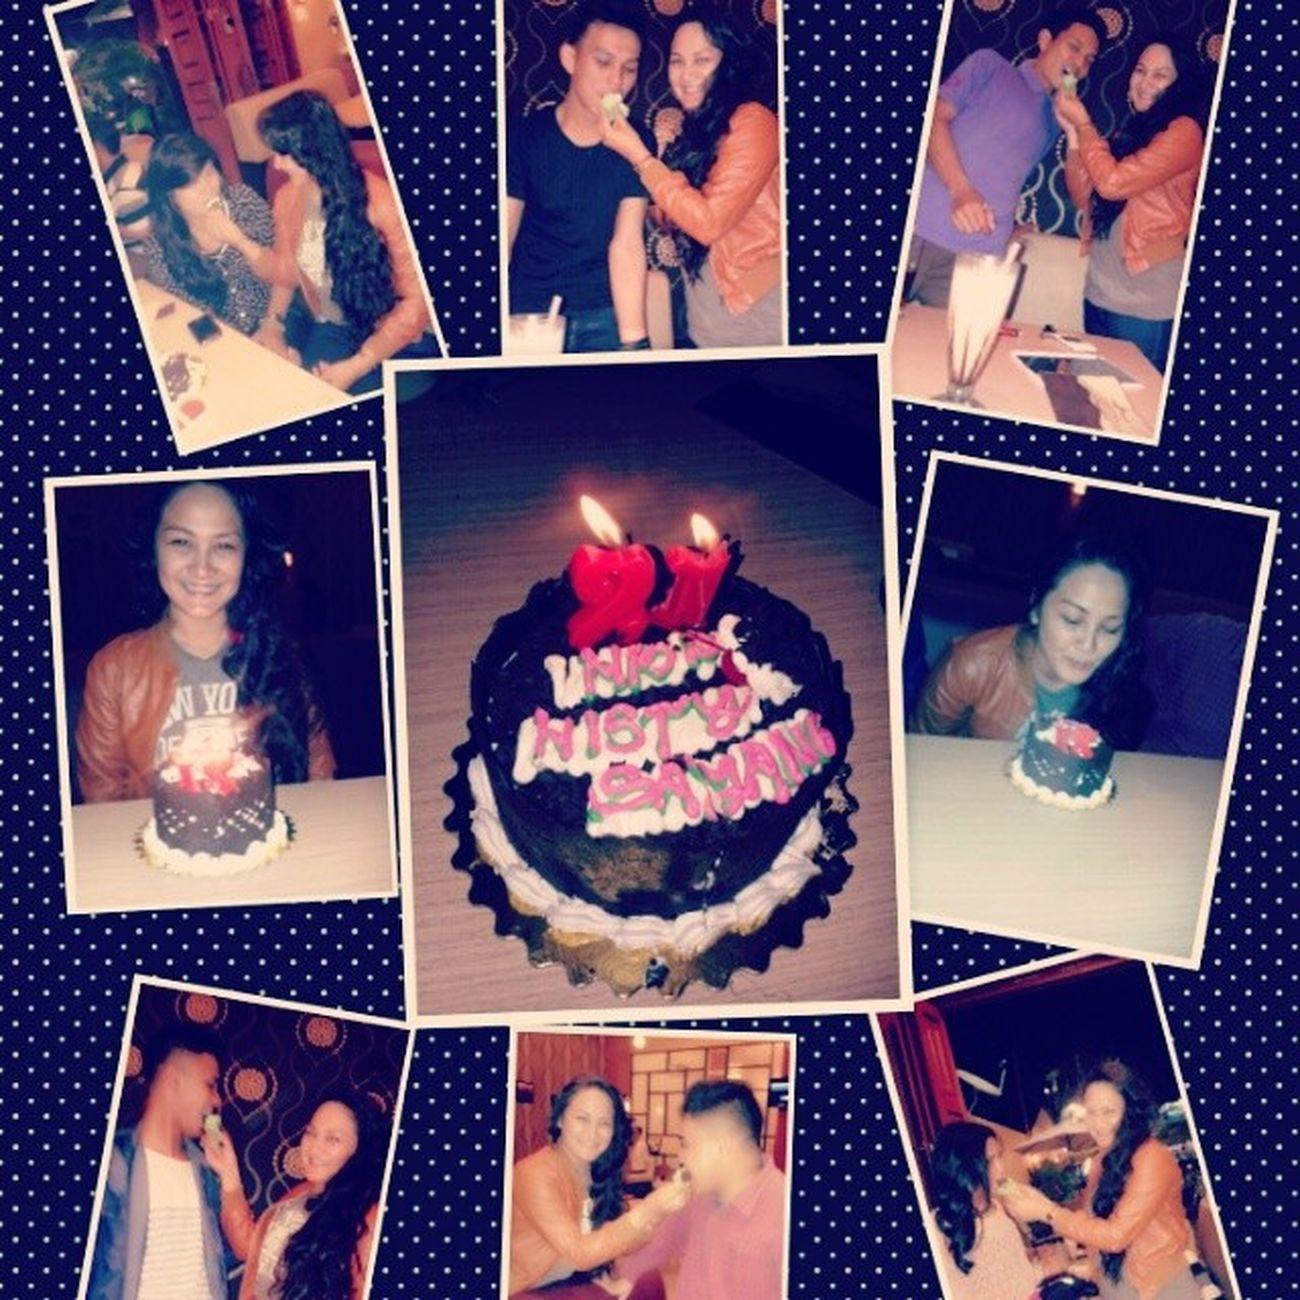 Histy birthday Latepost Birthday Cake Reborn cafe coffee makyung 21 friends together joyful